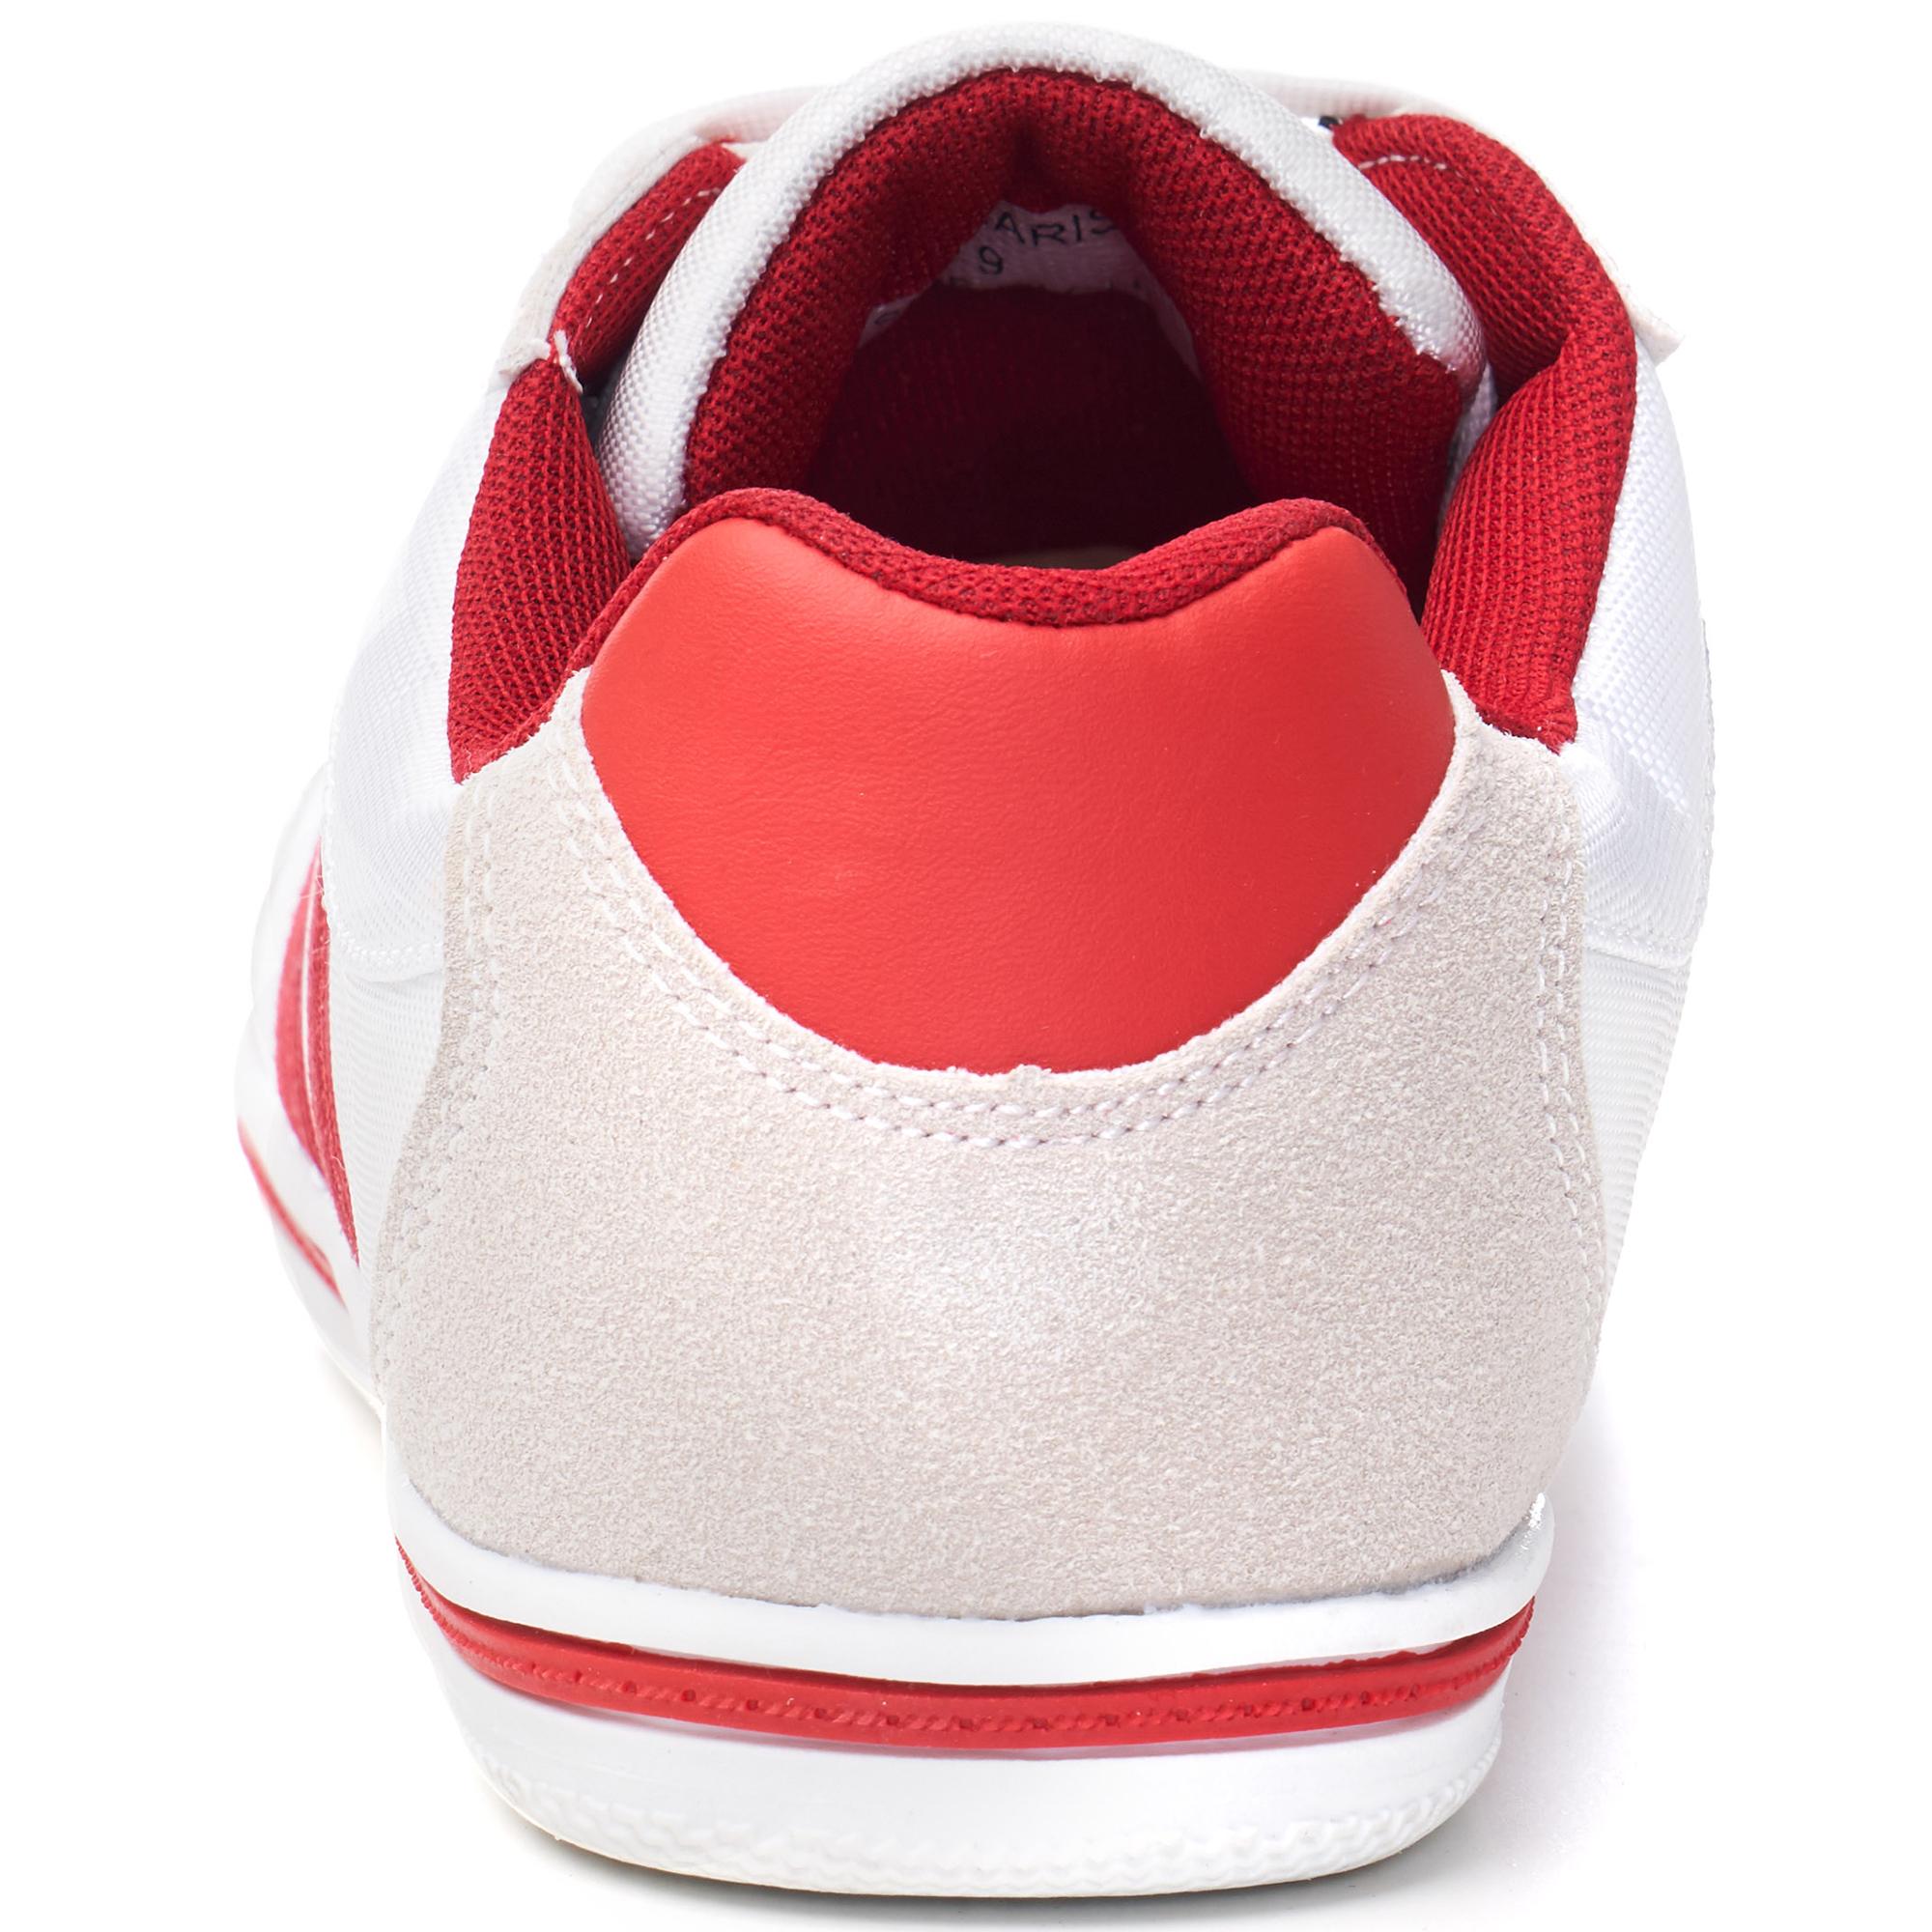 Alpine-Swiss-Haris-Mens-Retro-Striped-Athletic-Shoes-Fashion-Sneaker-Tennis-Shoe thumbnail 18